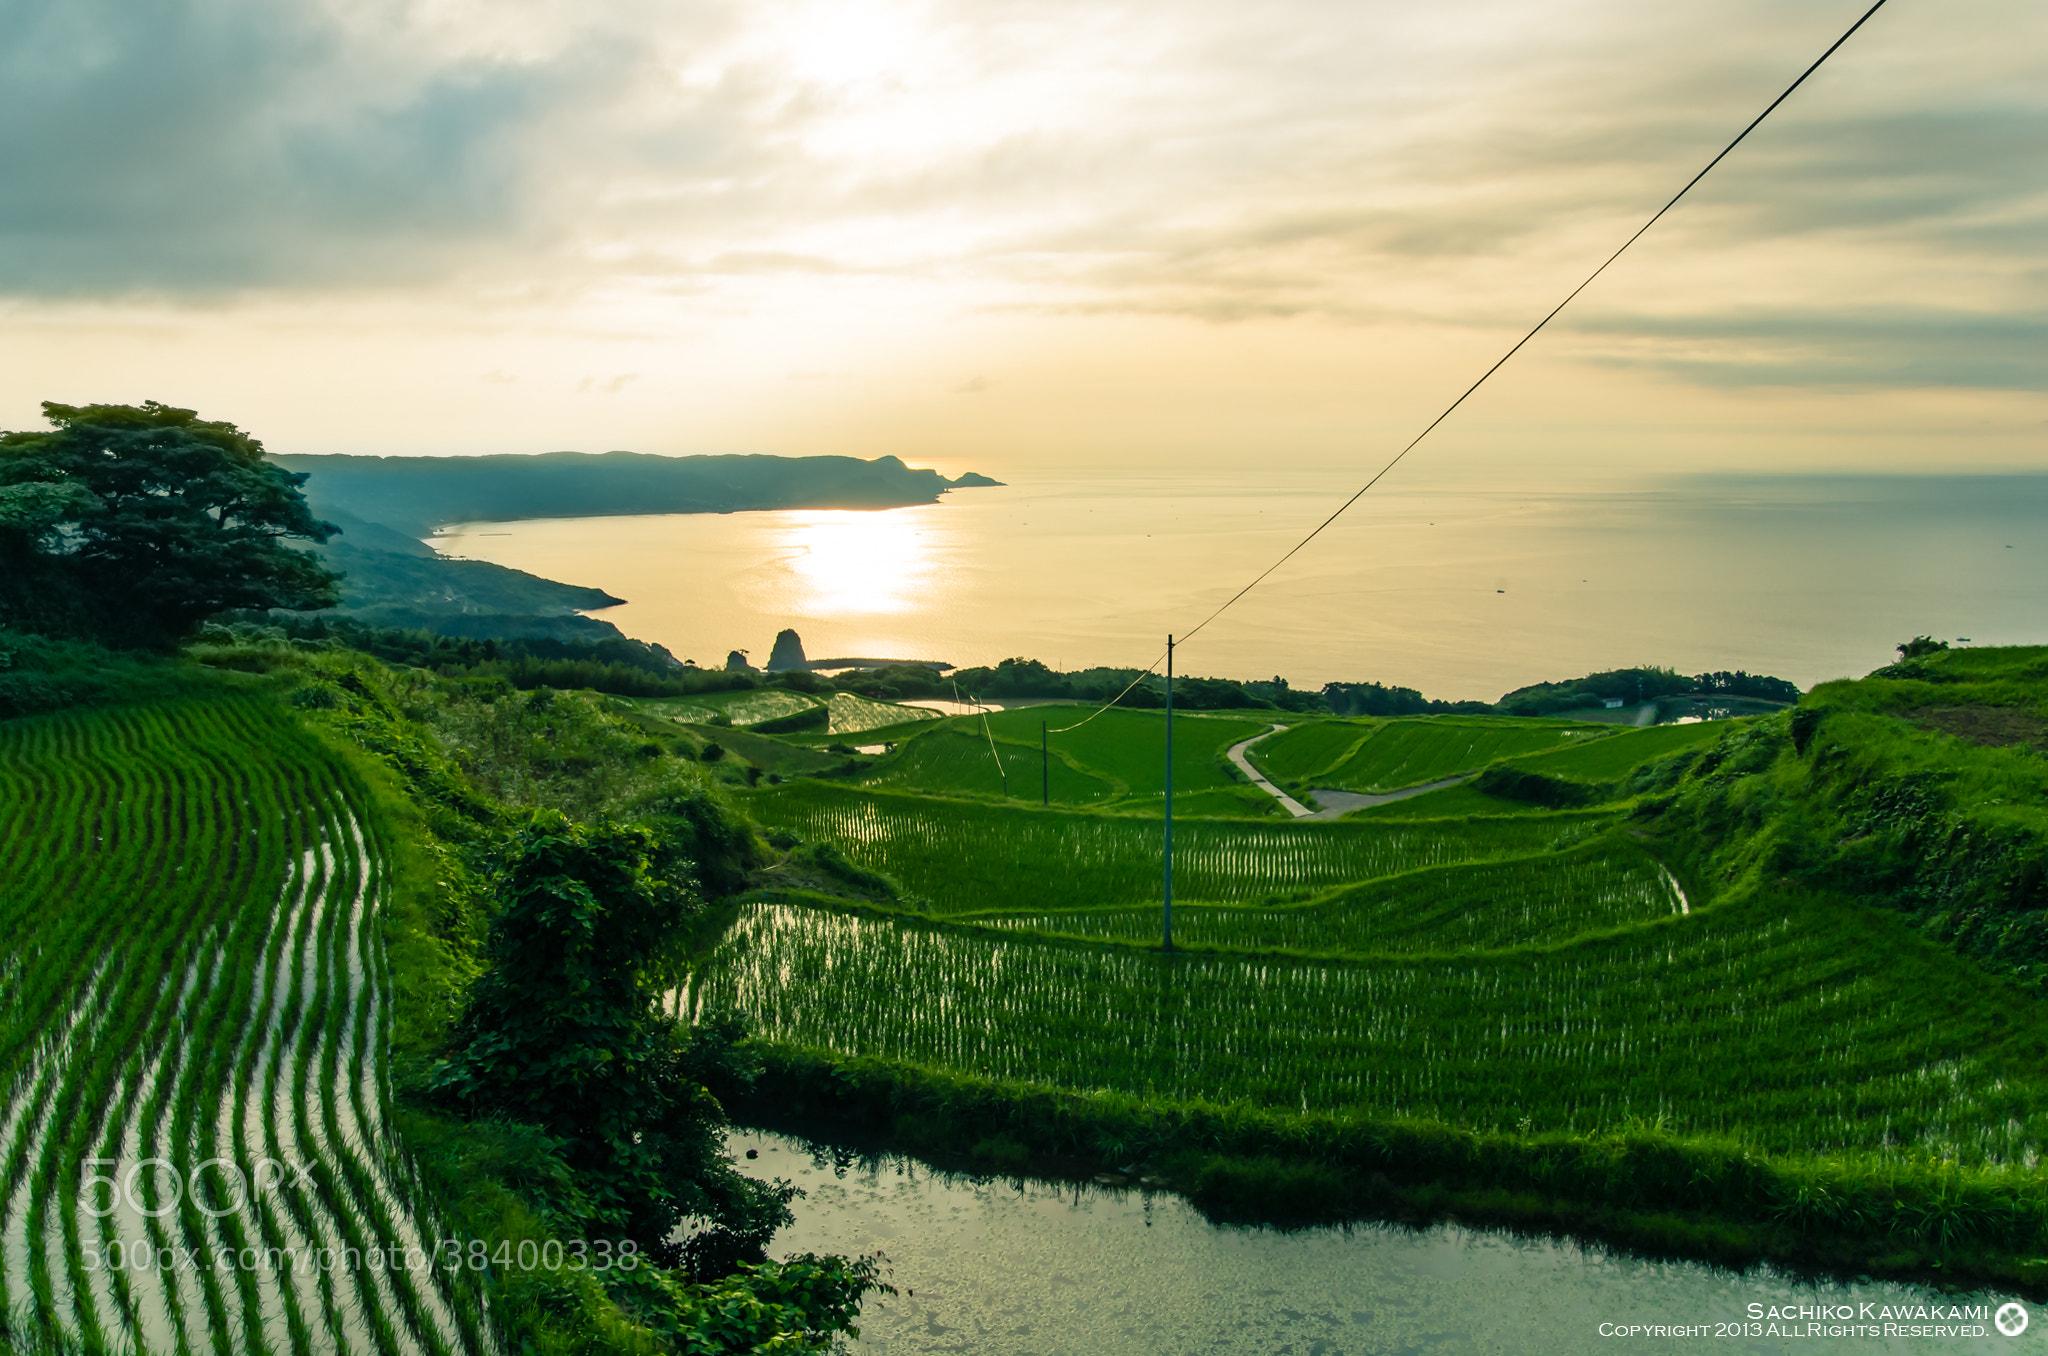 Photograph 日本の棚田 by Sachiko Kawakami on 500px